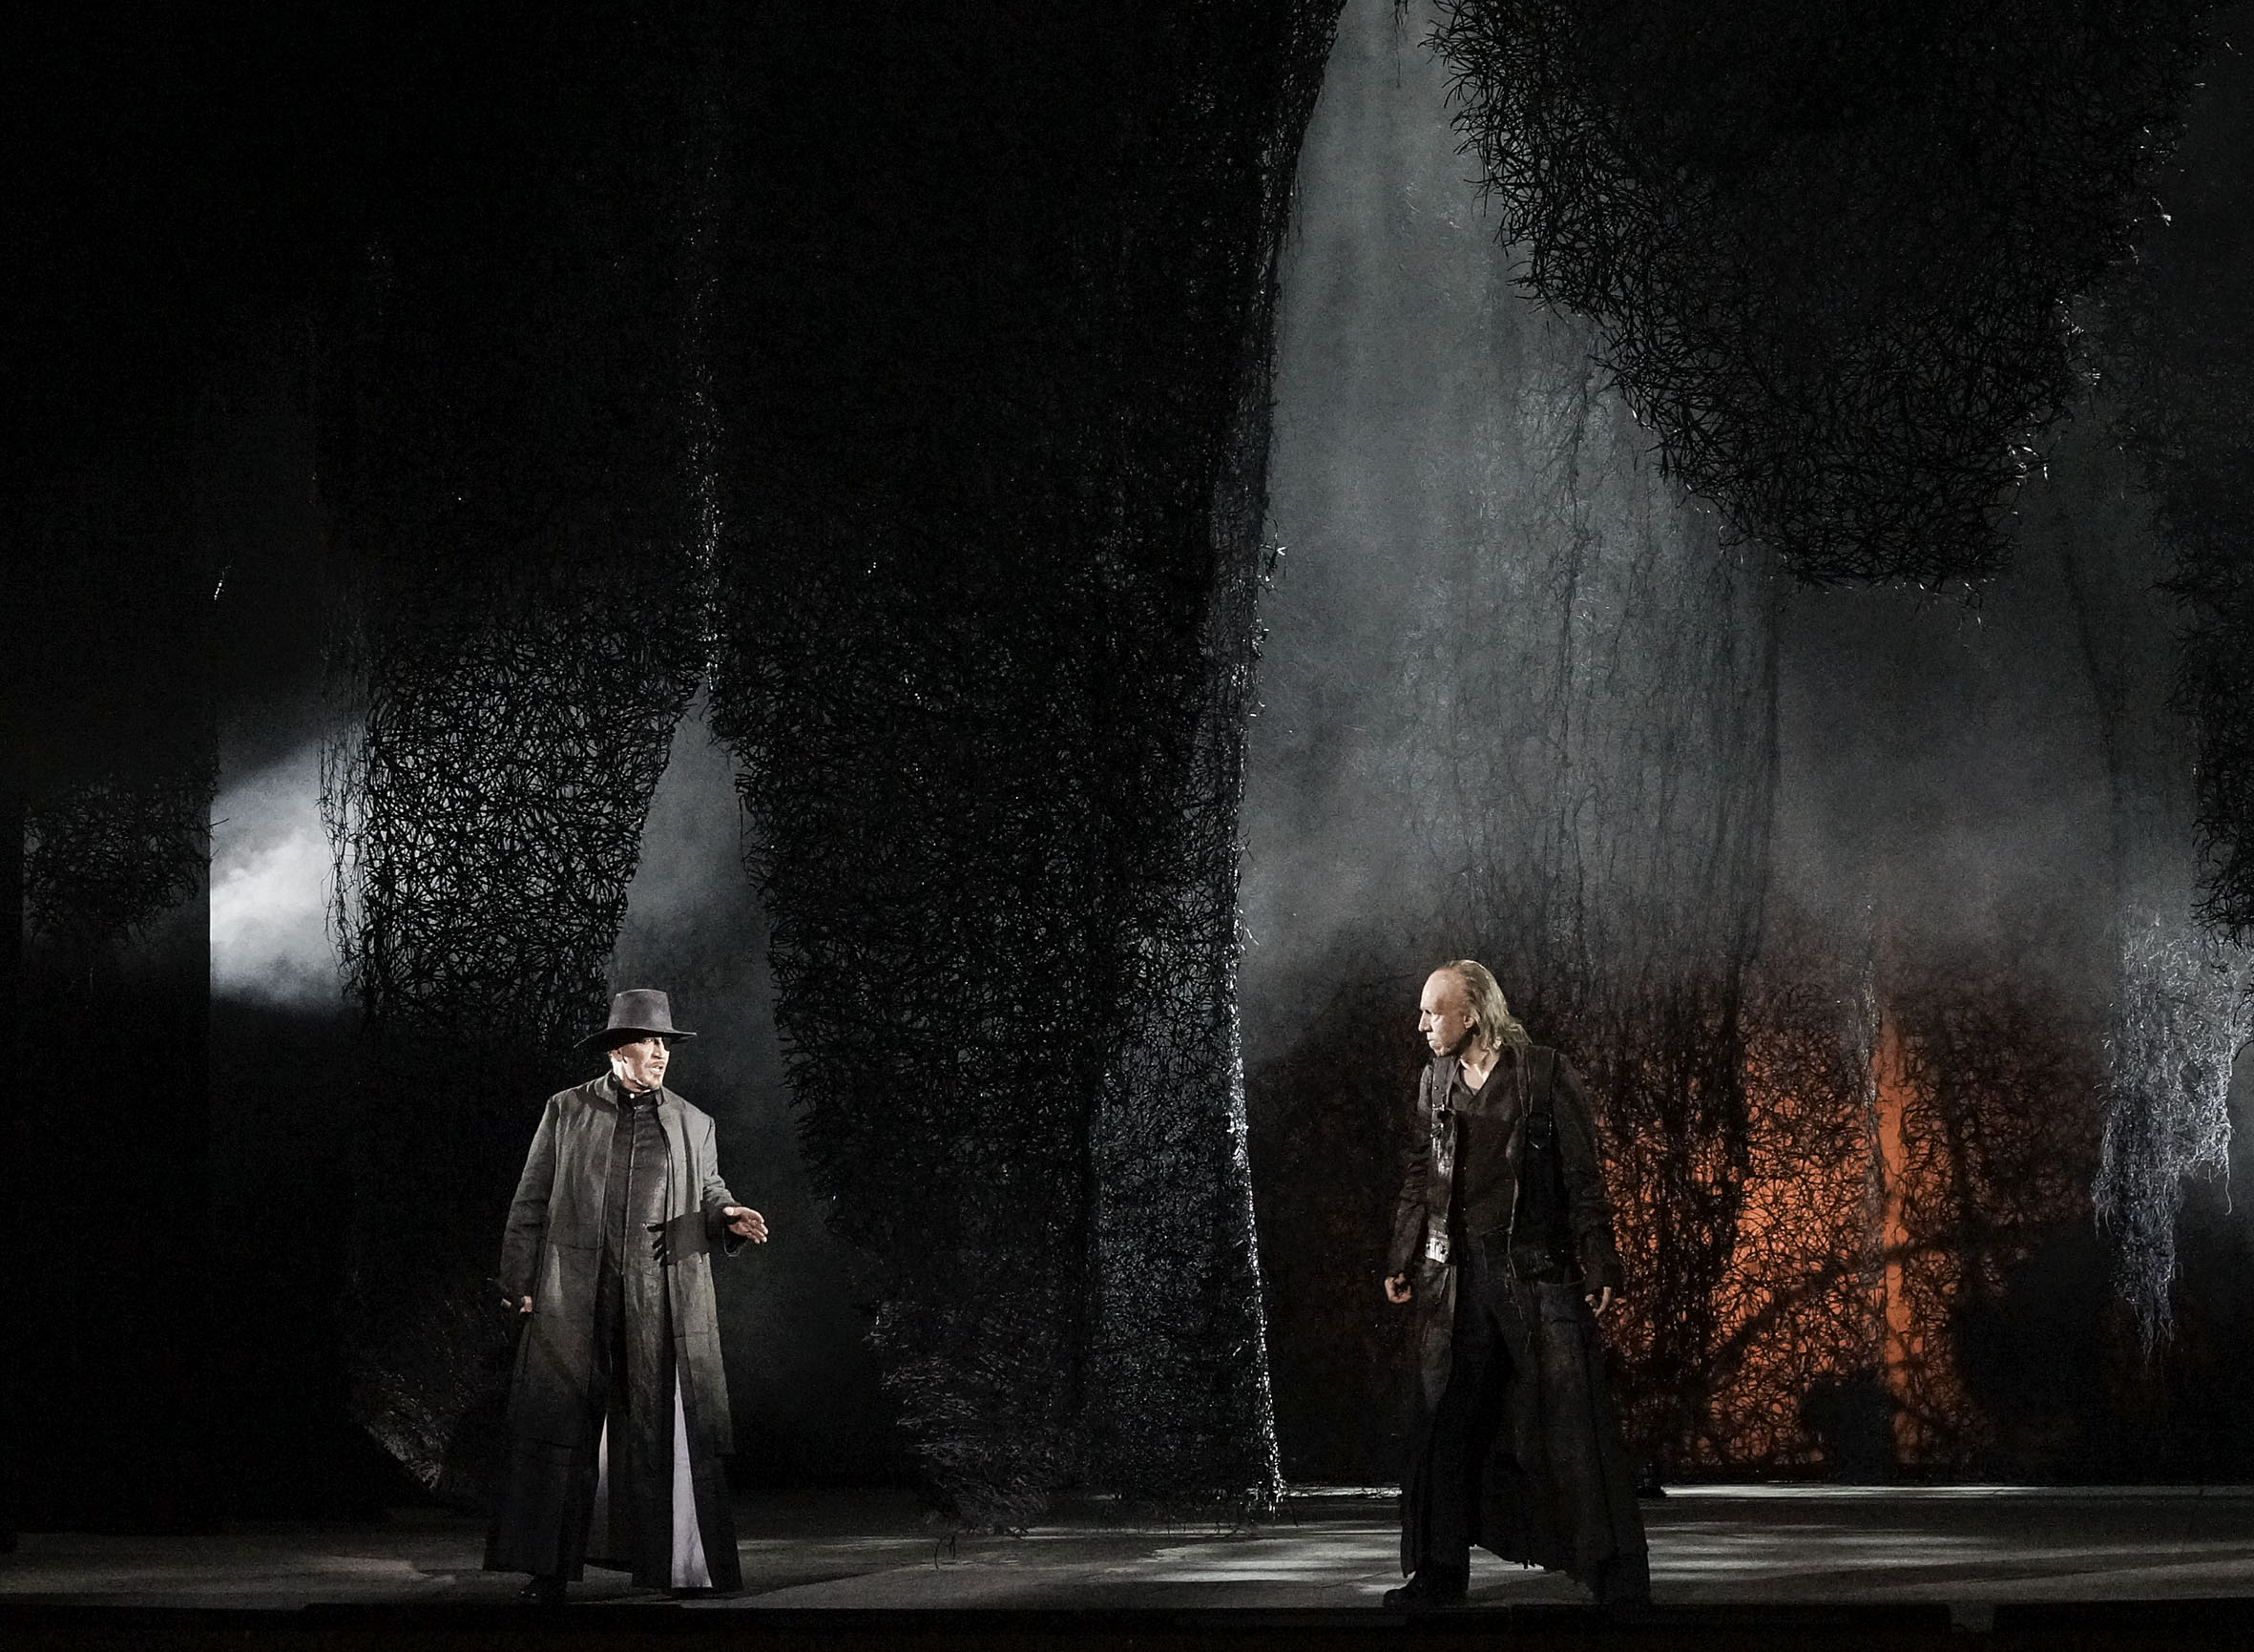 2017_Siegfried_stage design_Oper Kiel_photo by Olaf Struck_3.jpg